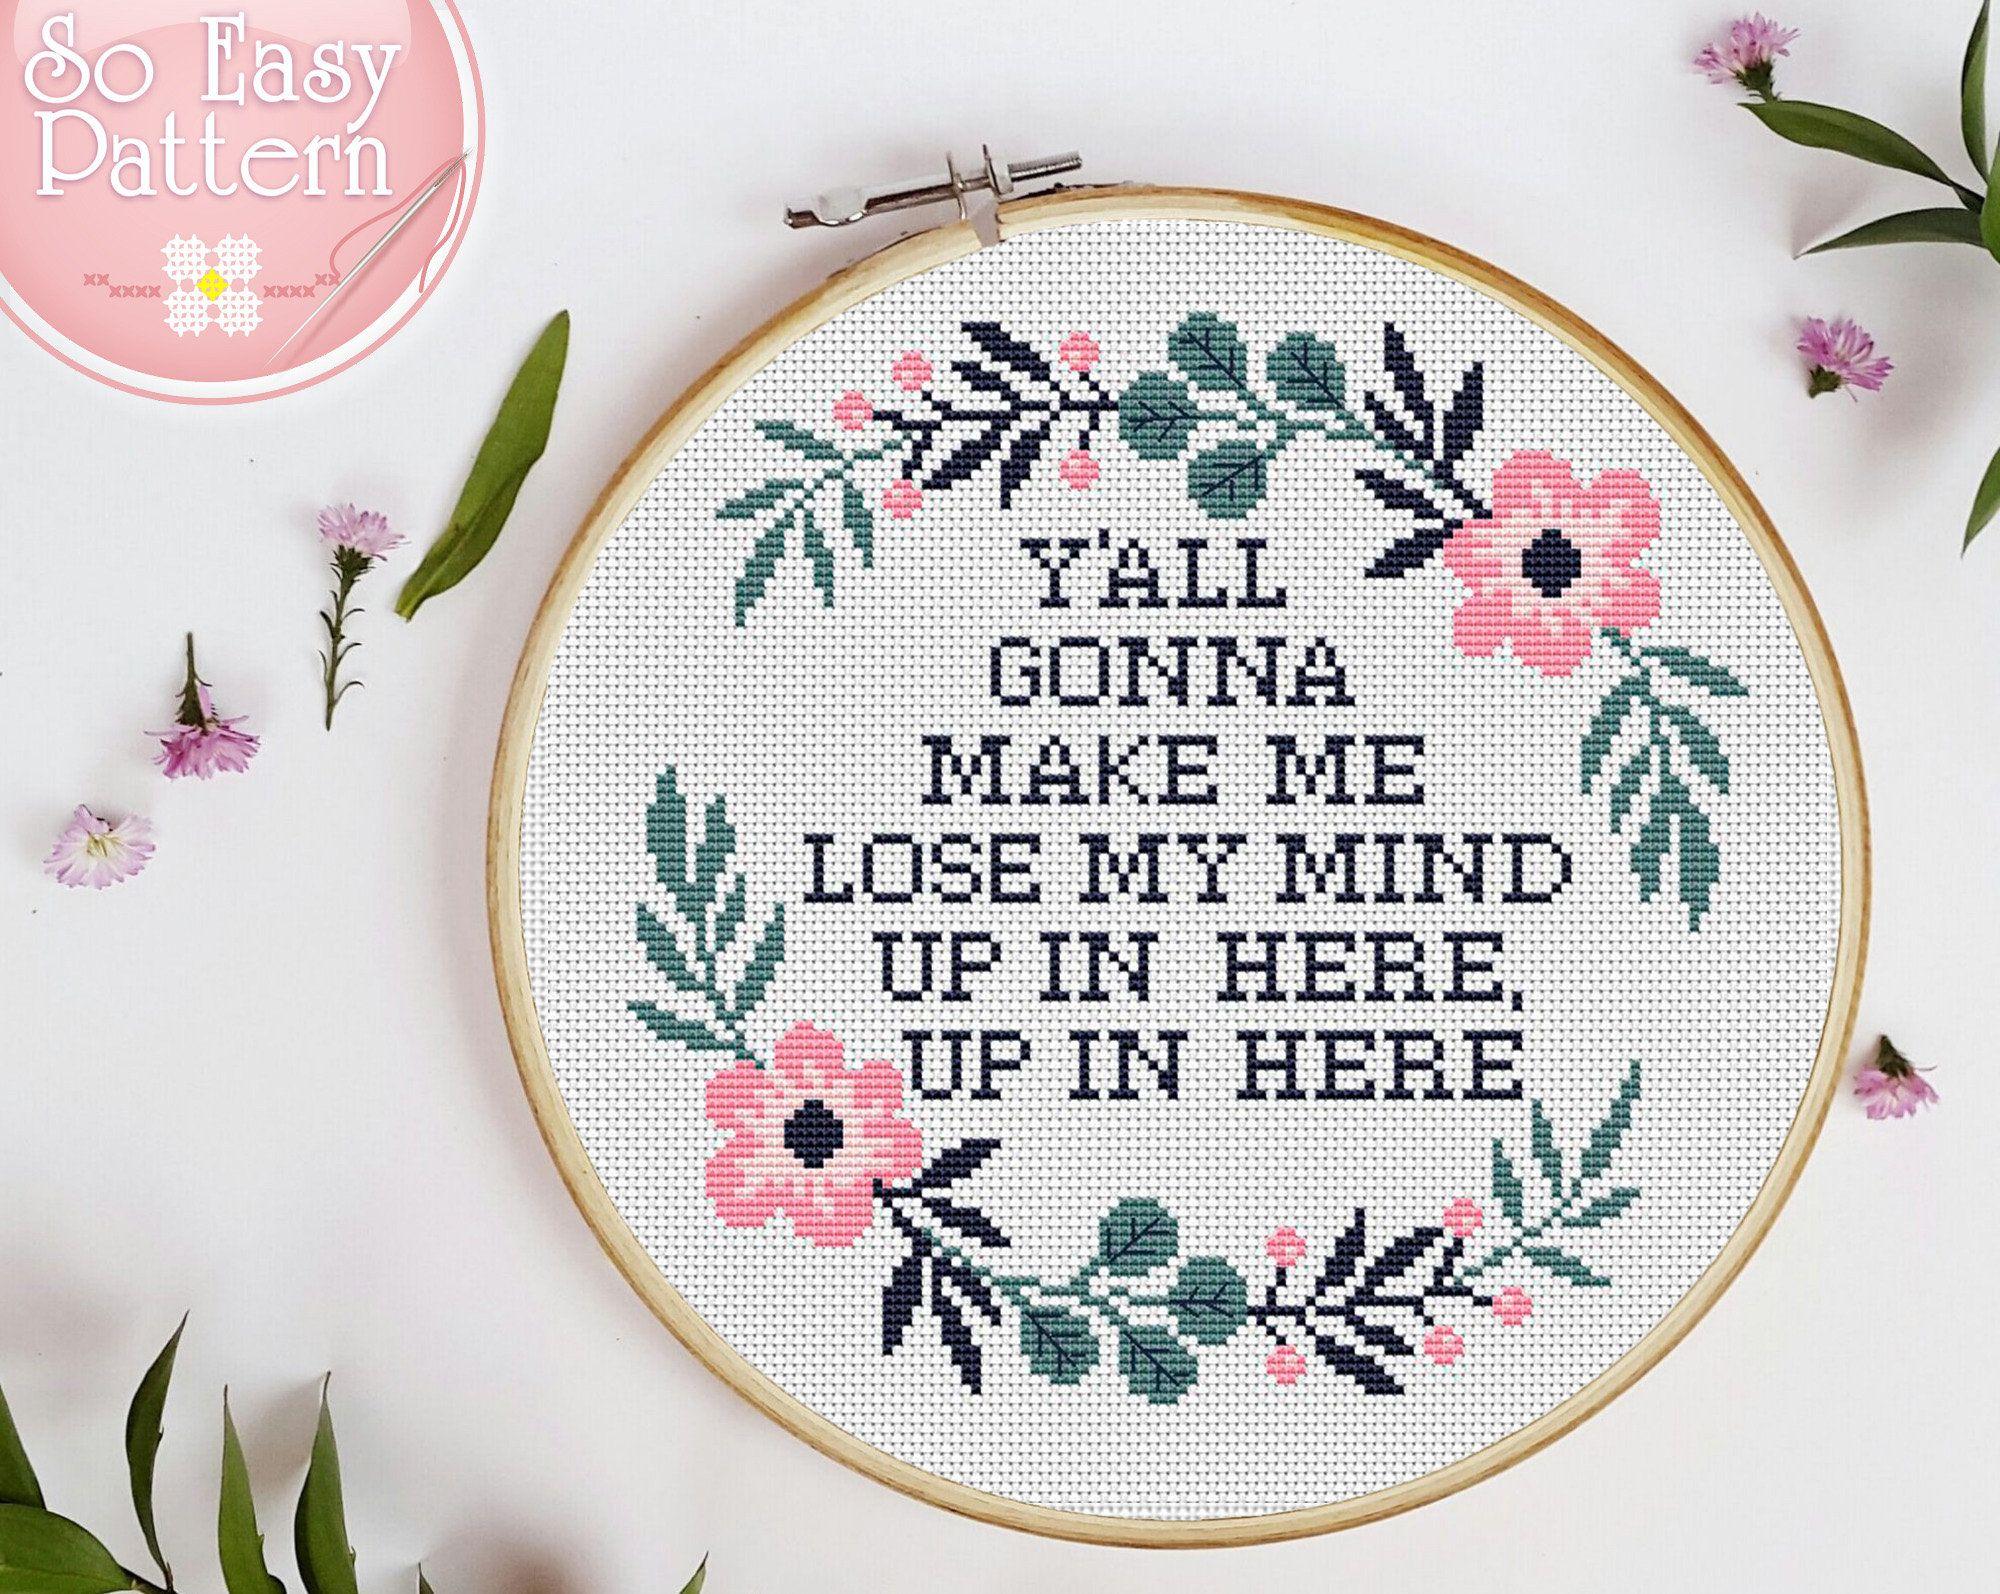 Photo of Funny Cross stitch PDF pattern Y'all gonna make me lose my mind Subversive cross stitch Quote xstitch chart Modern needlepoint patterns